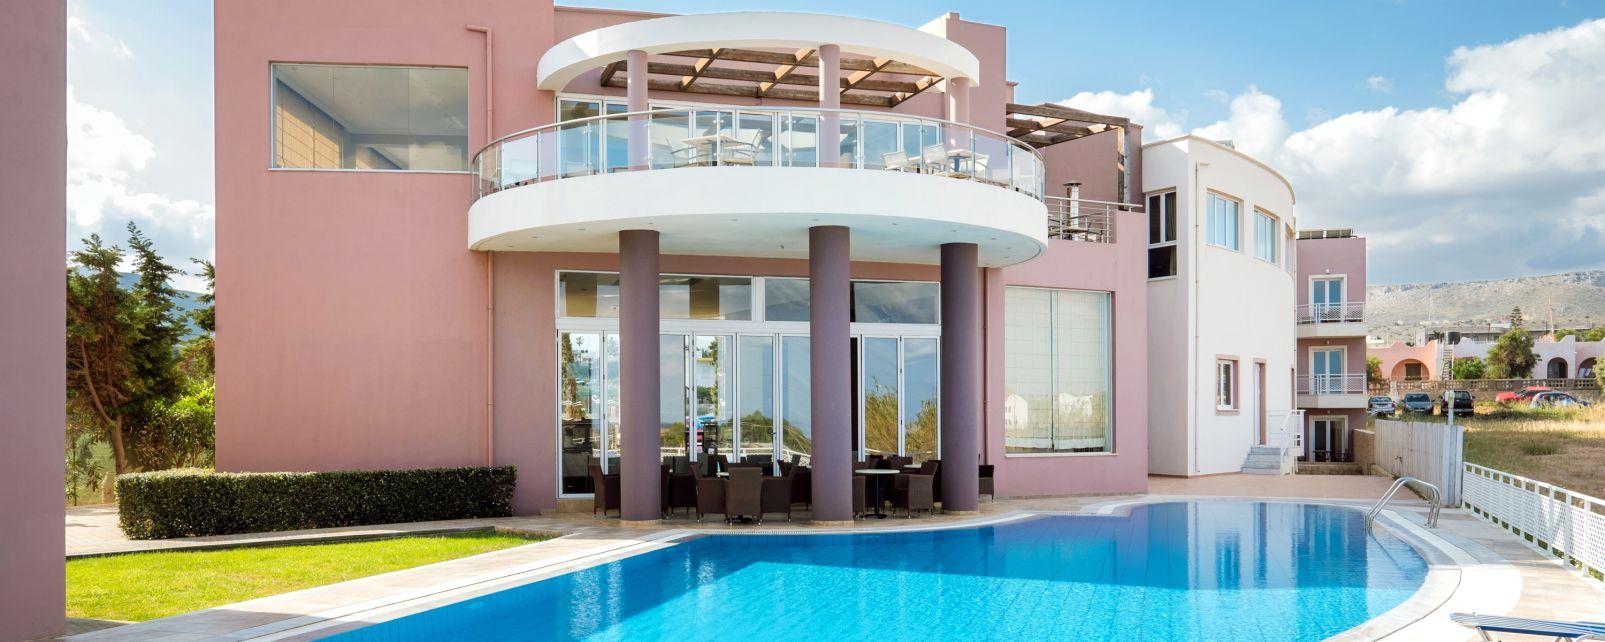 Hotel Maxi Club Gouves Sea & Mare